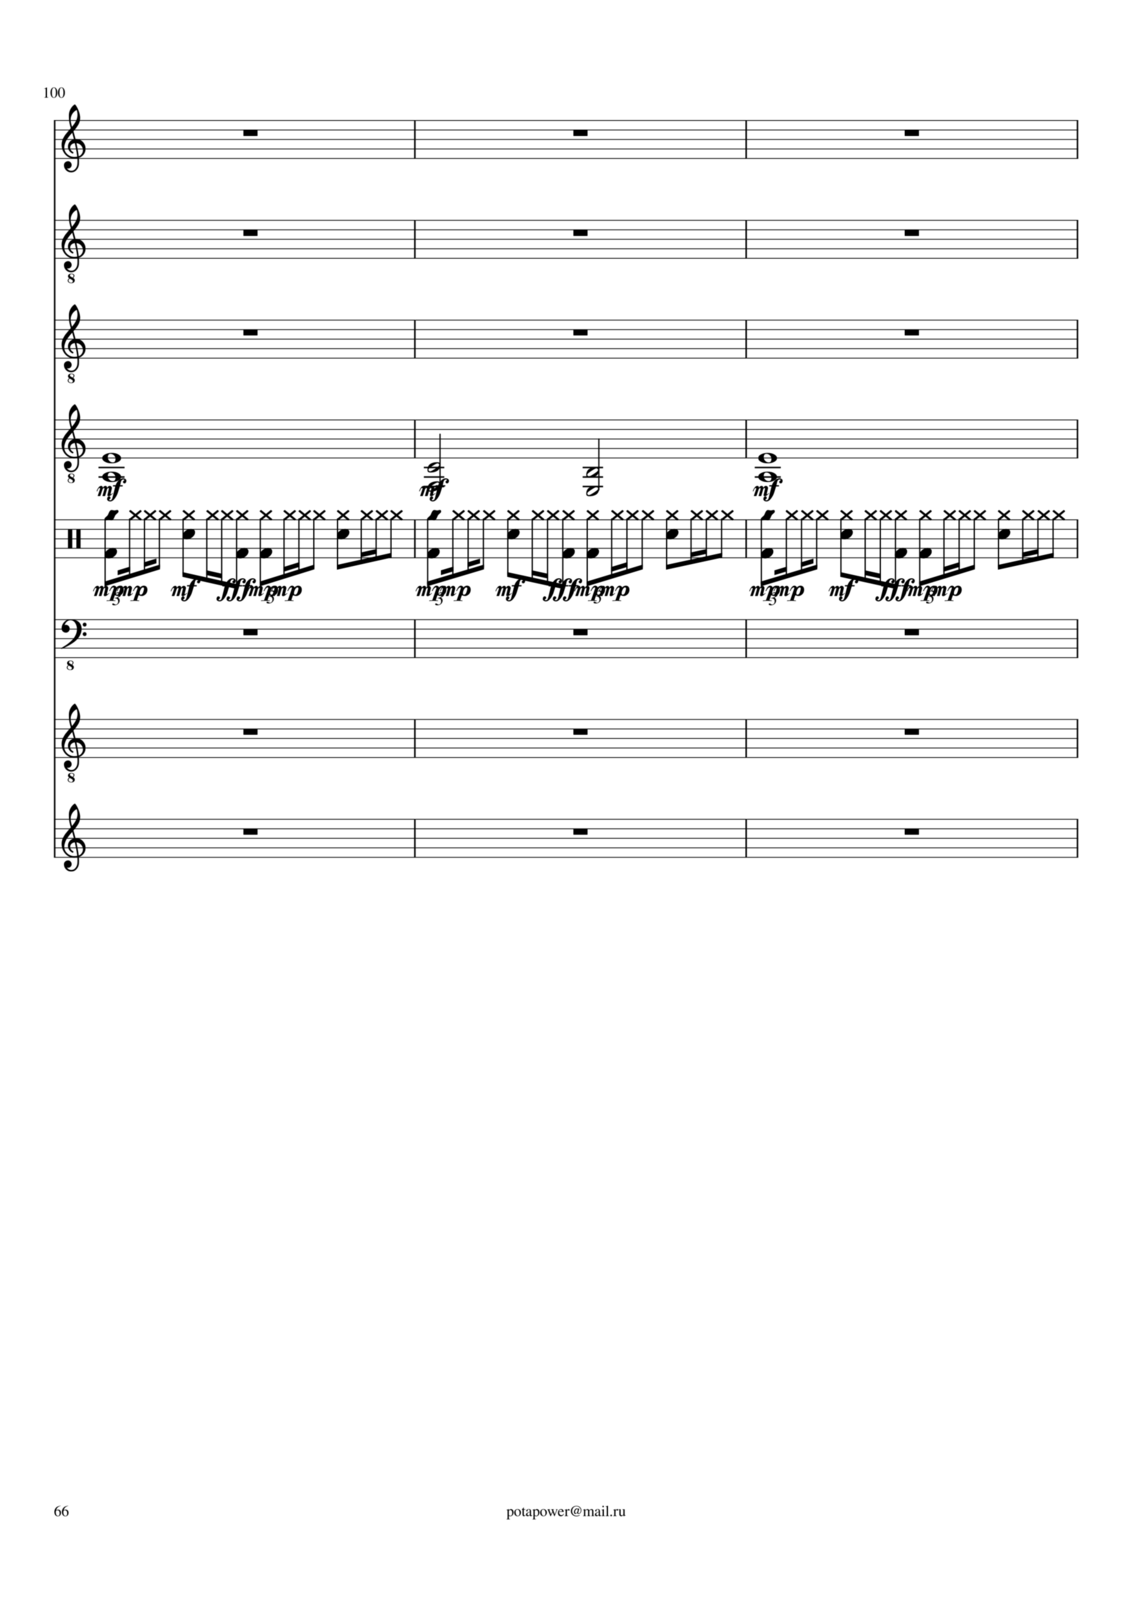 Korolevstvo slez slide, Image 66